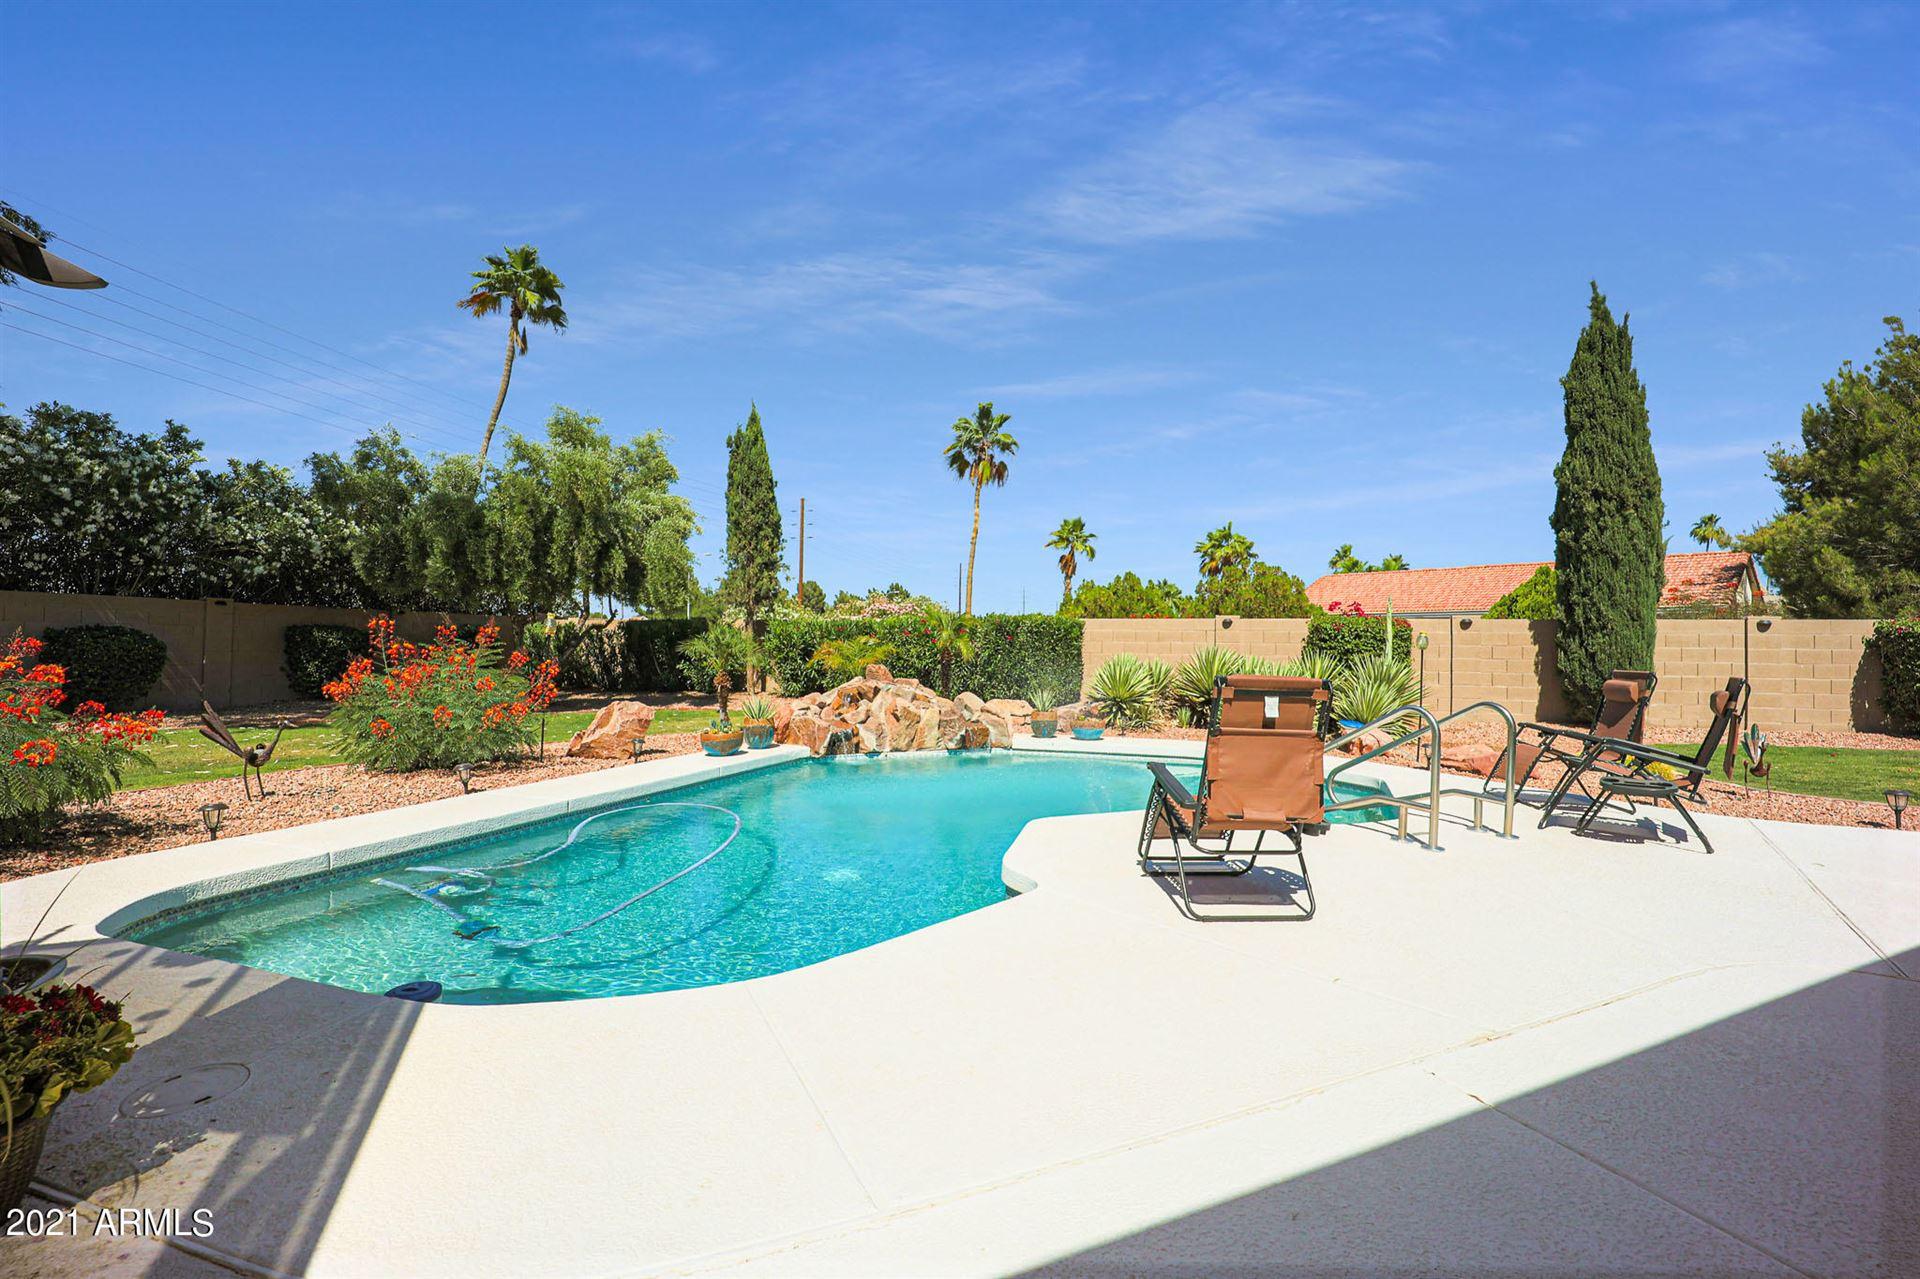 Photo of 10714 E BURGESS Court, Sun Lakes, AZ 85248 (MLS # 6232454)